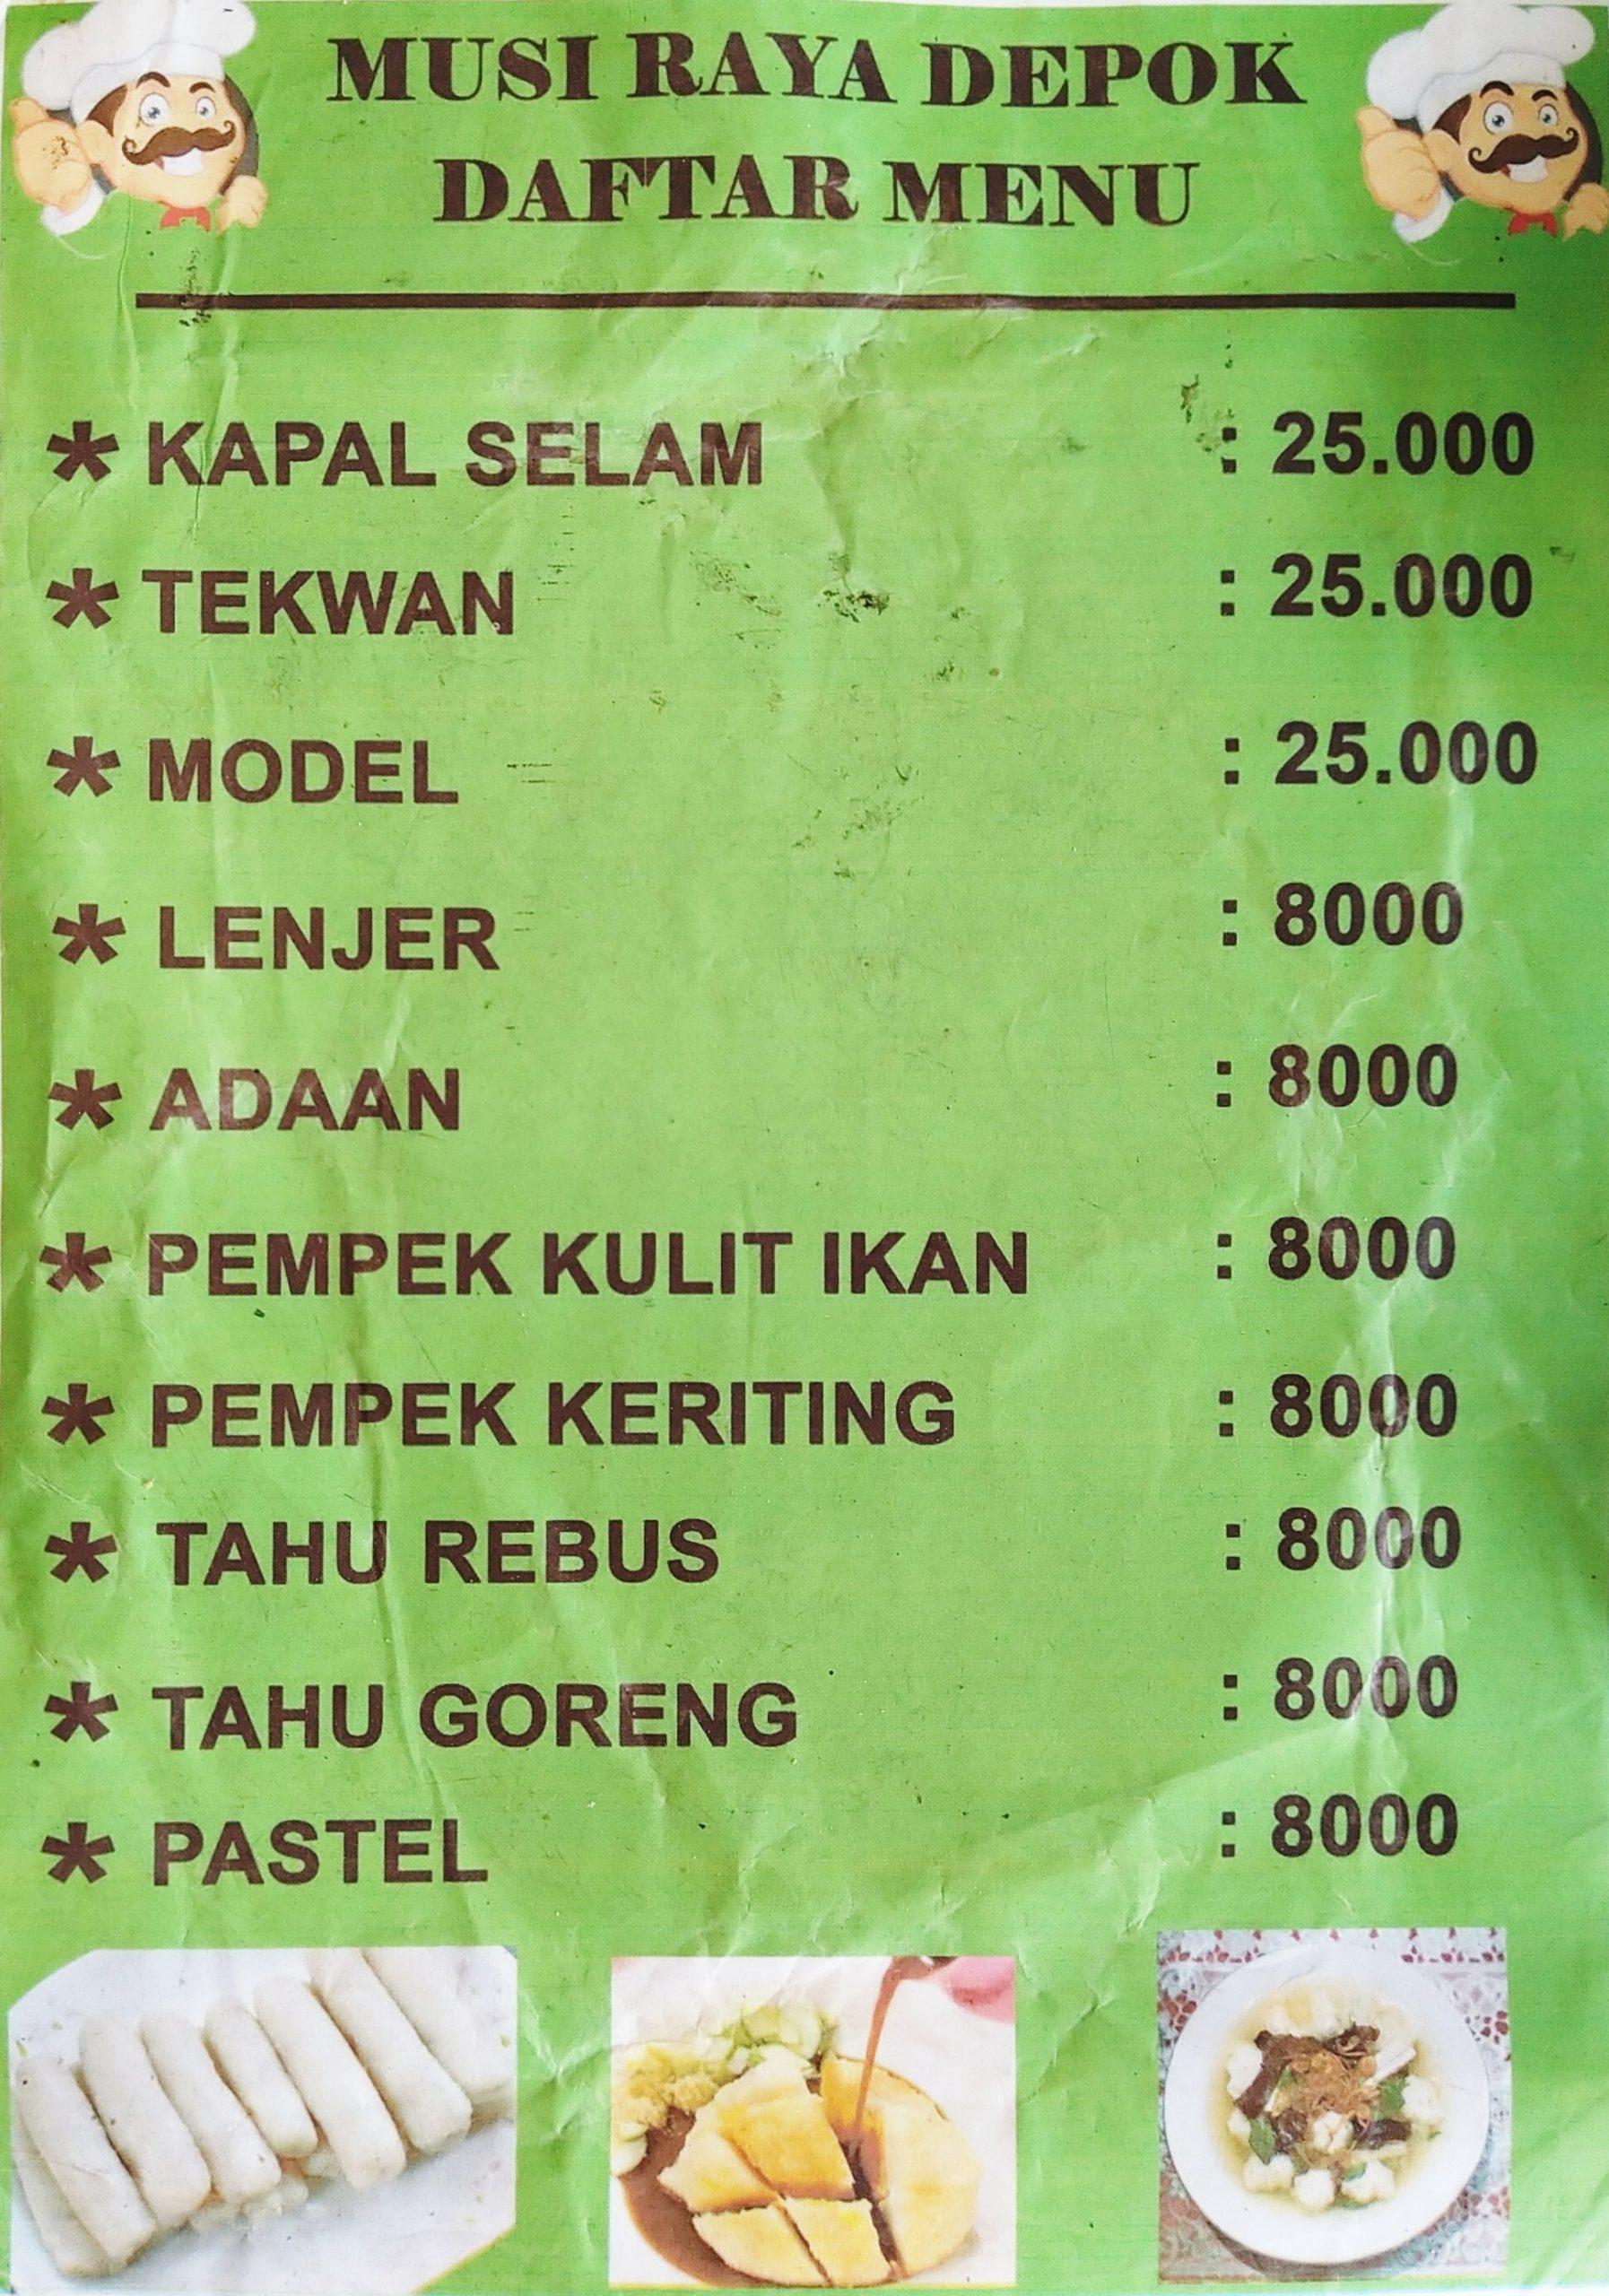 Pempek Palembang Musi Raya Menü - Zomato Indonesia serapportantà Rebus Noel